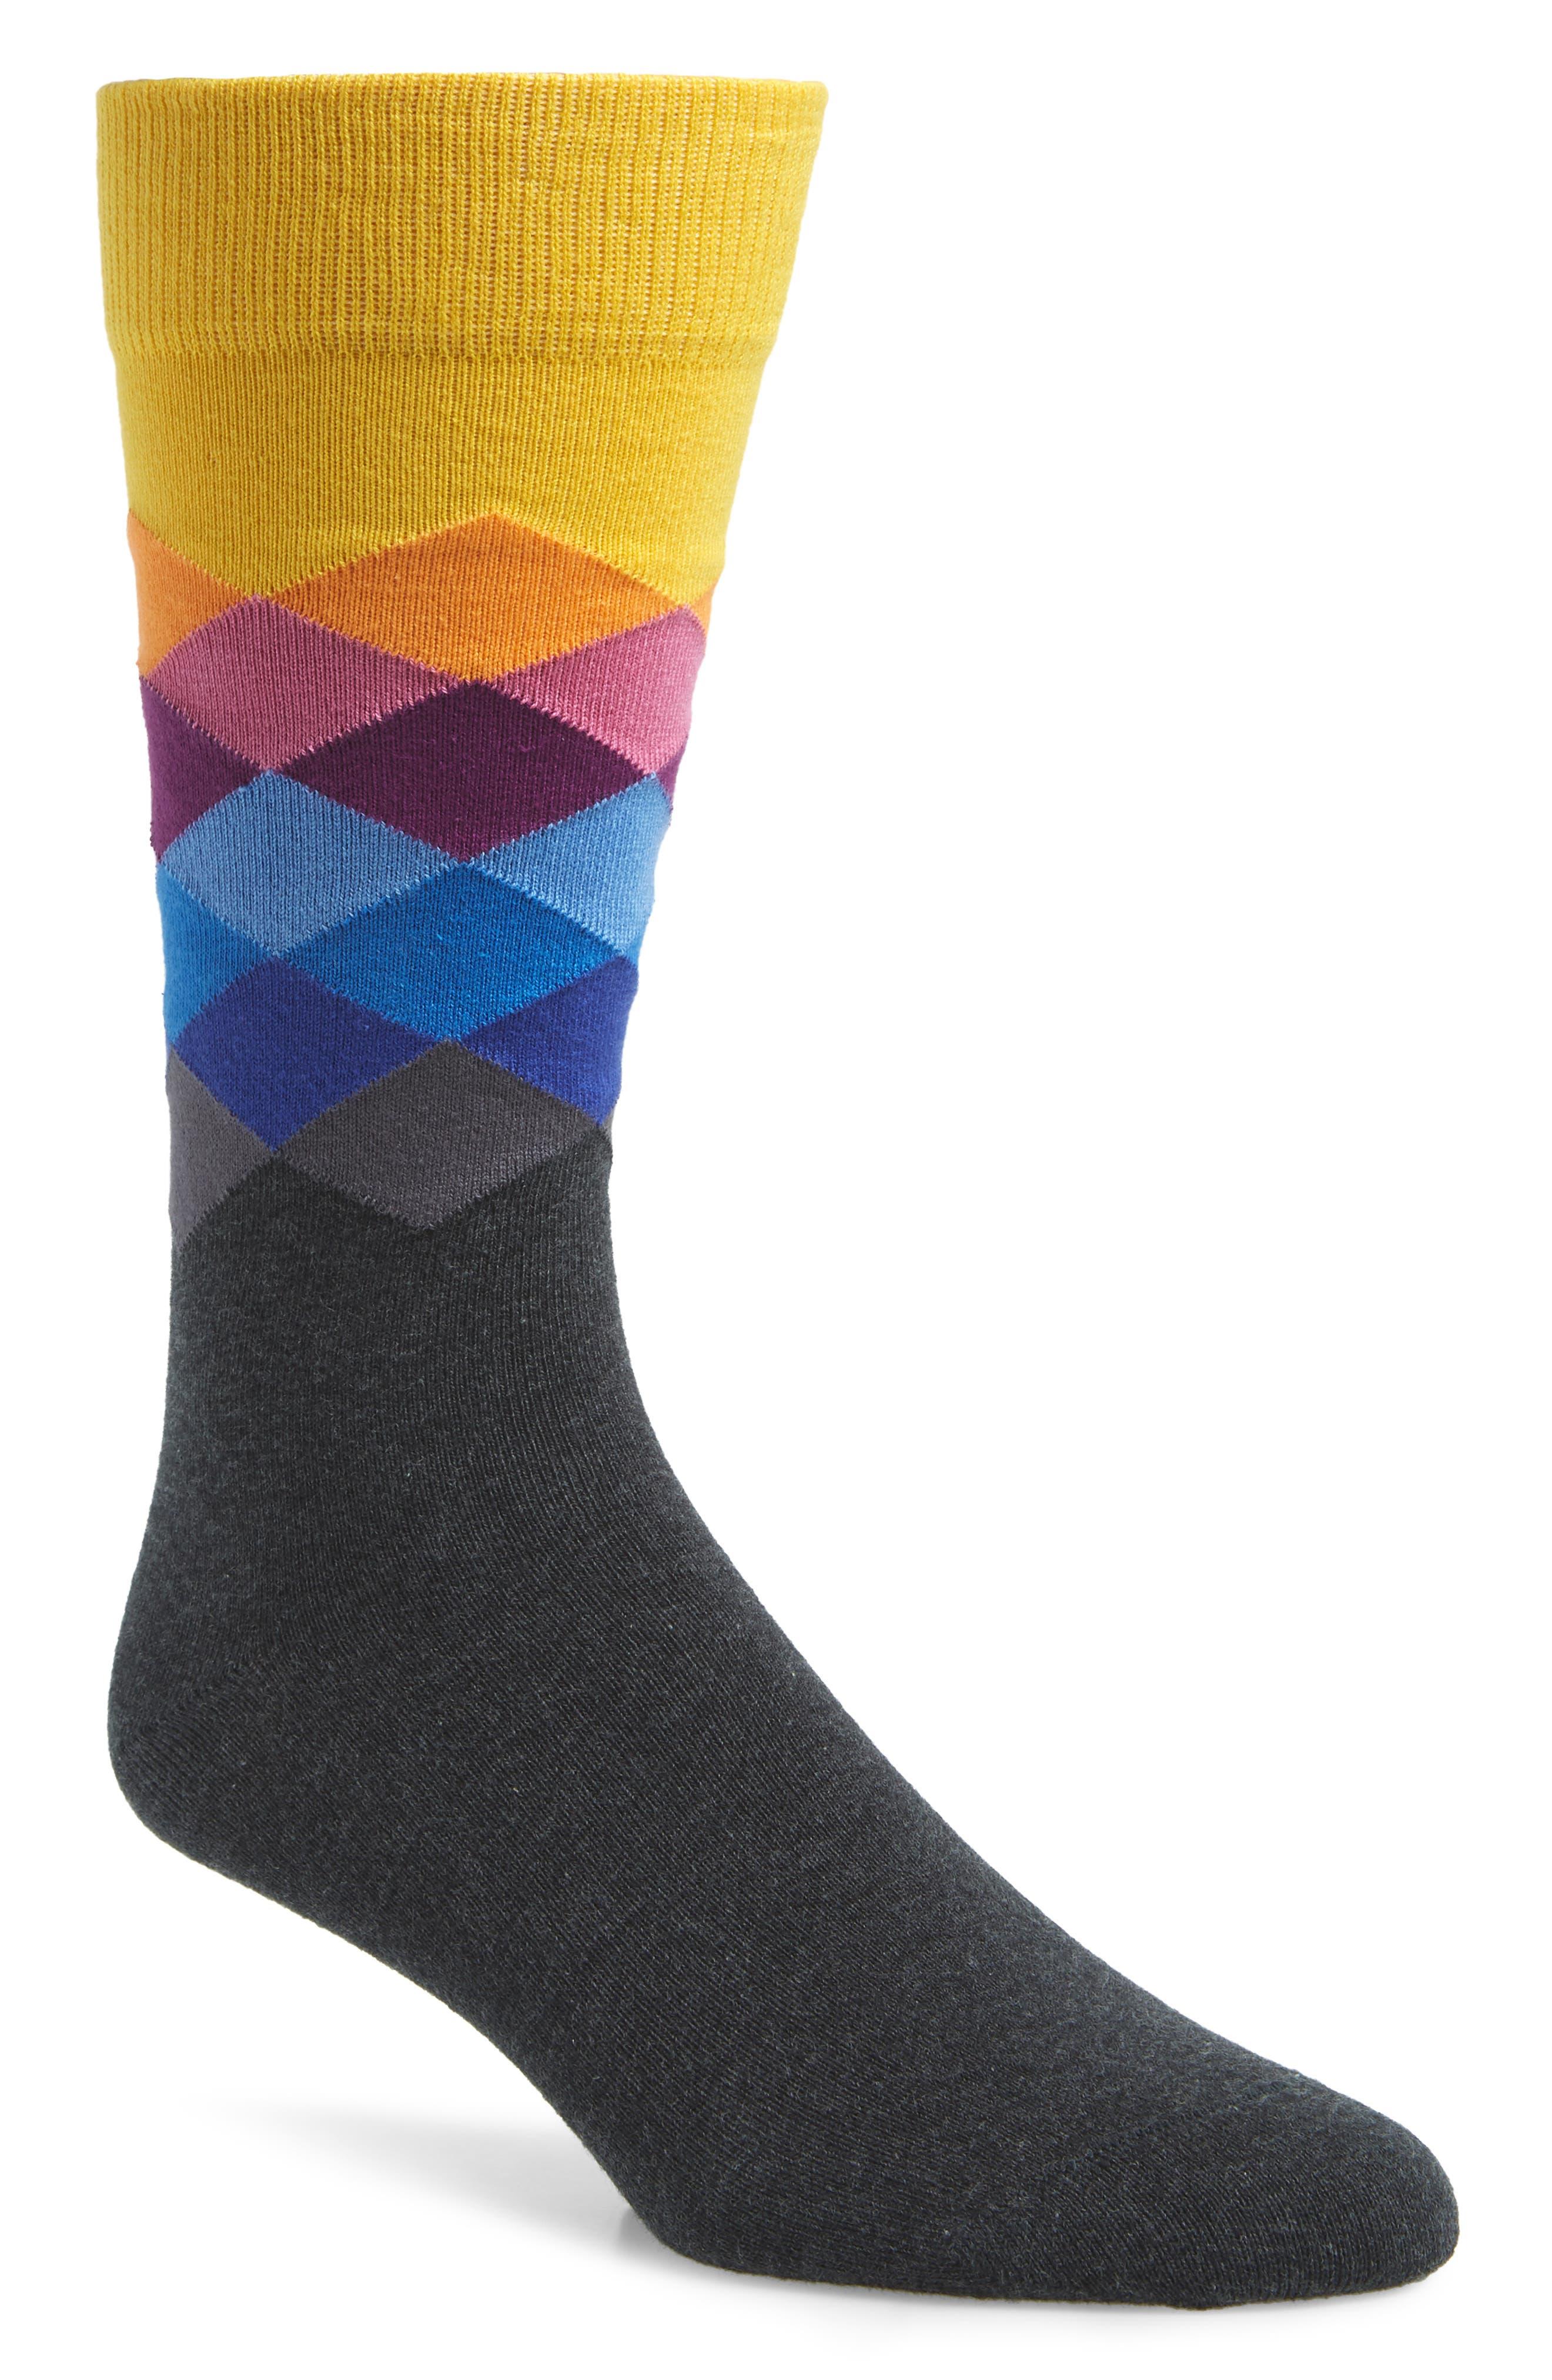 Diamond Socks,                             Main thumbnail 1, color,                             001